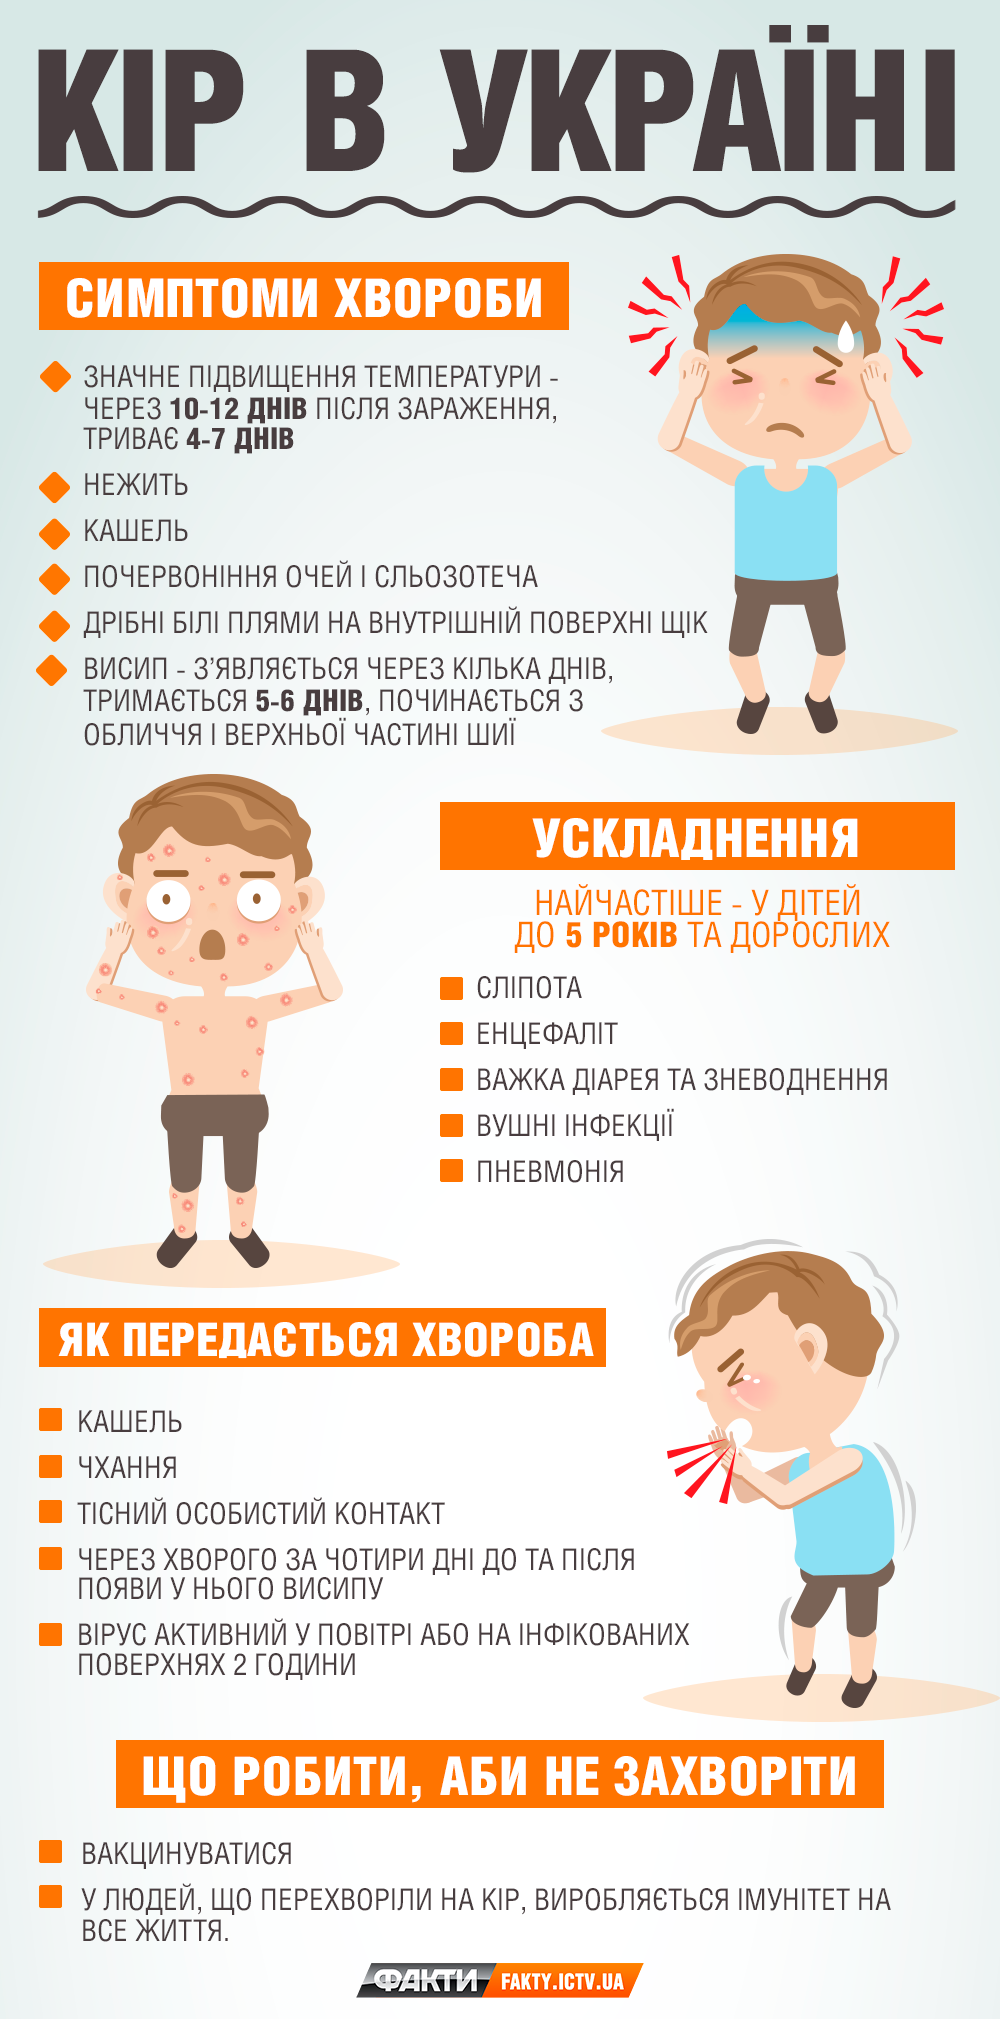 kir-v-ukrayini_1